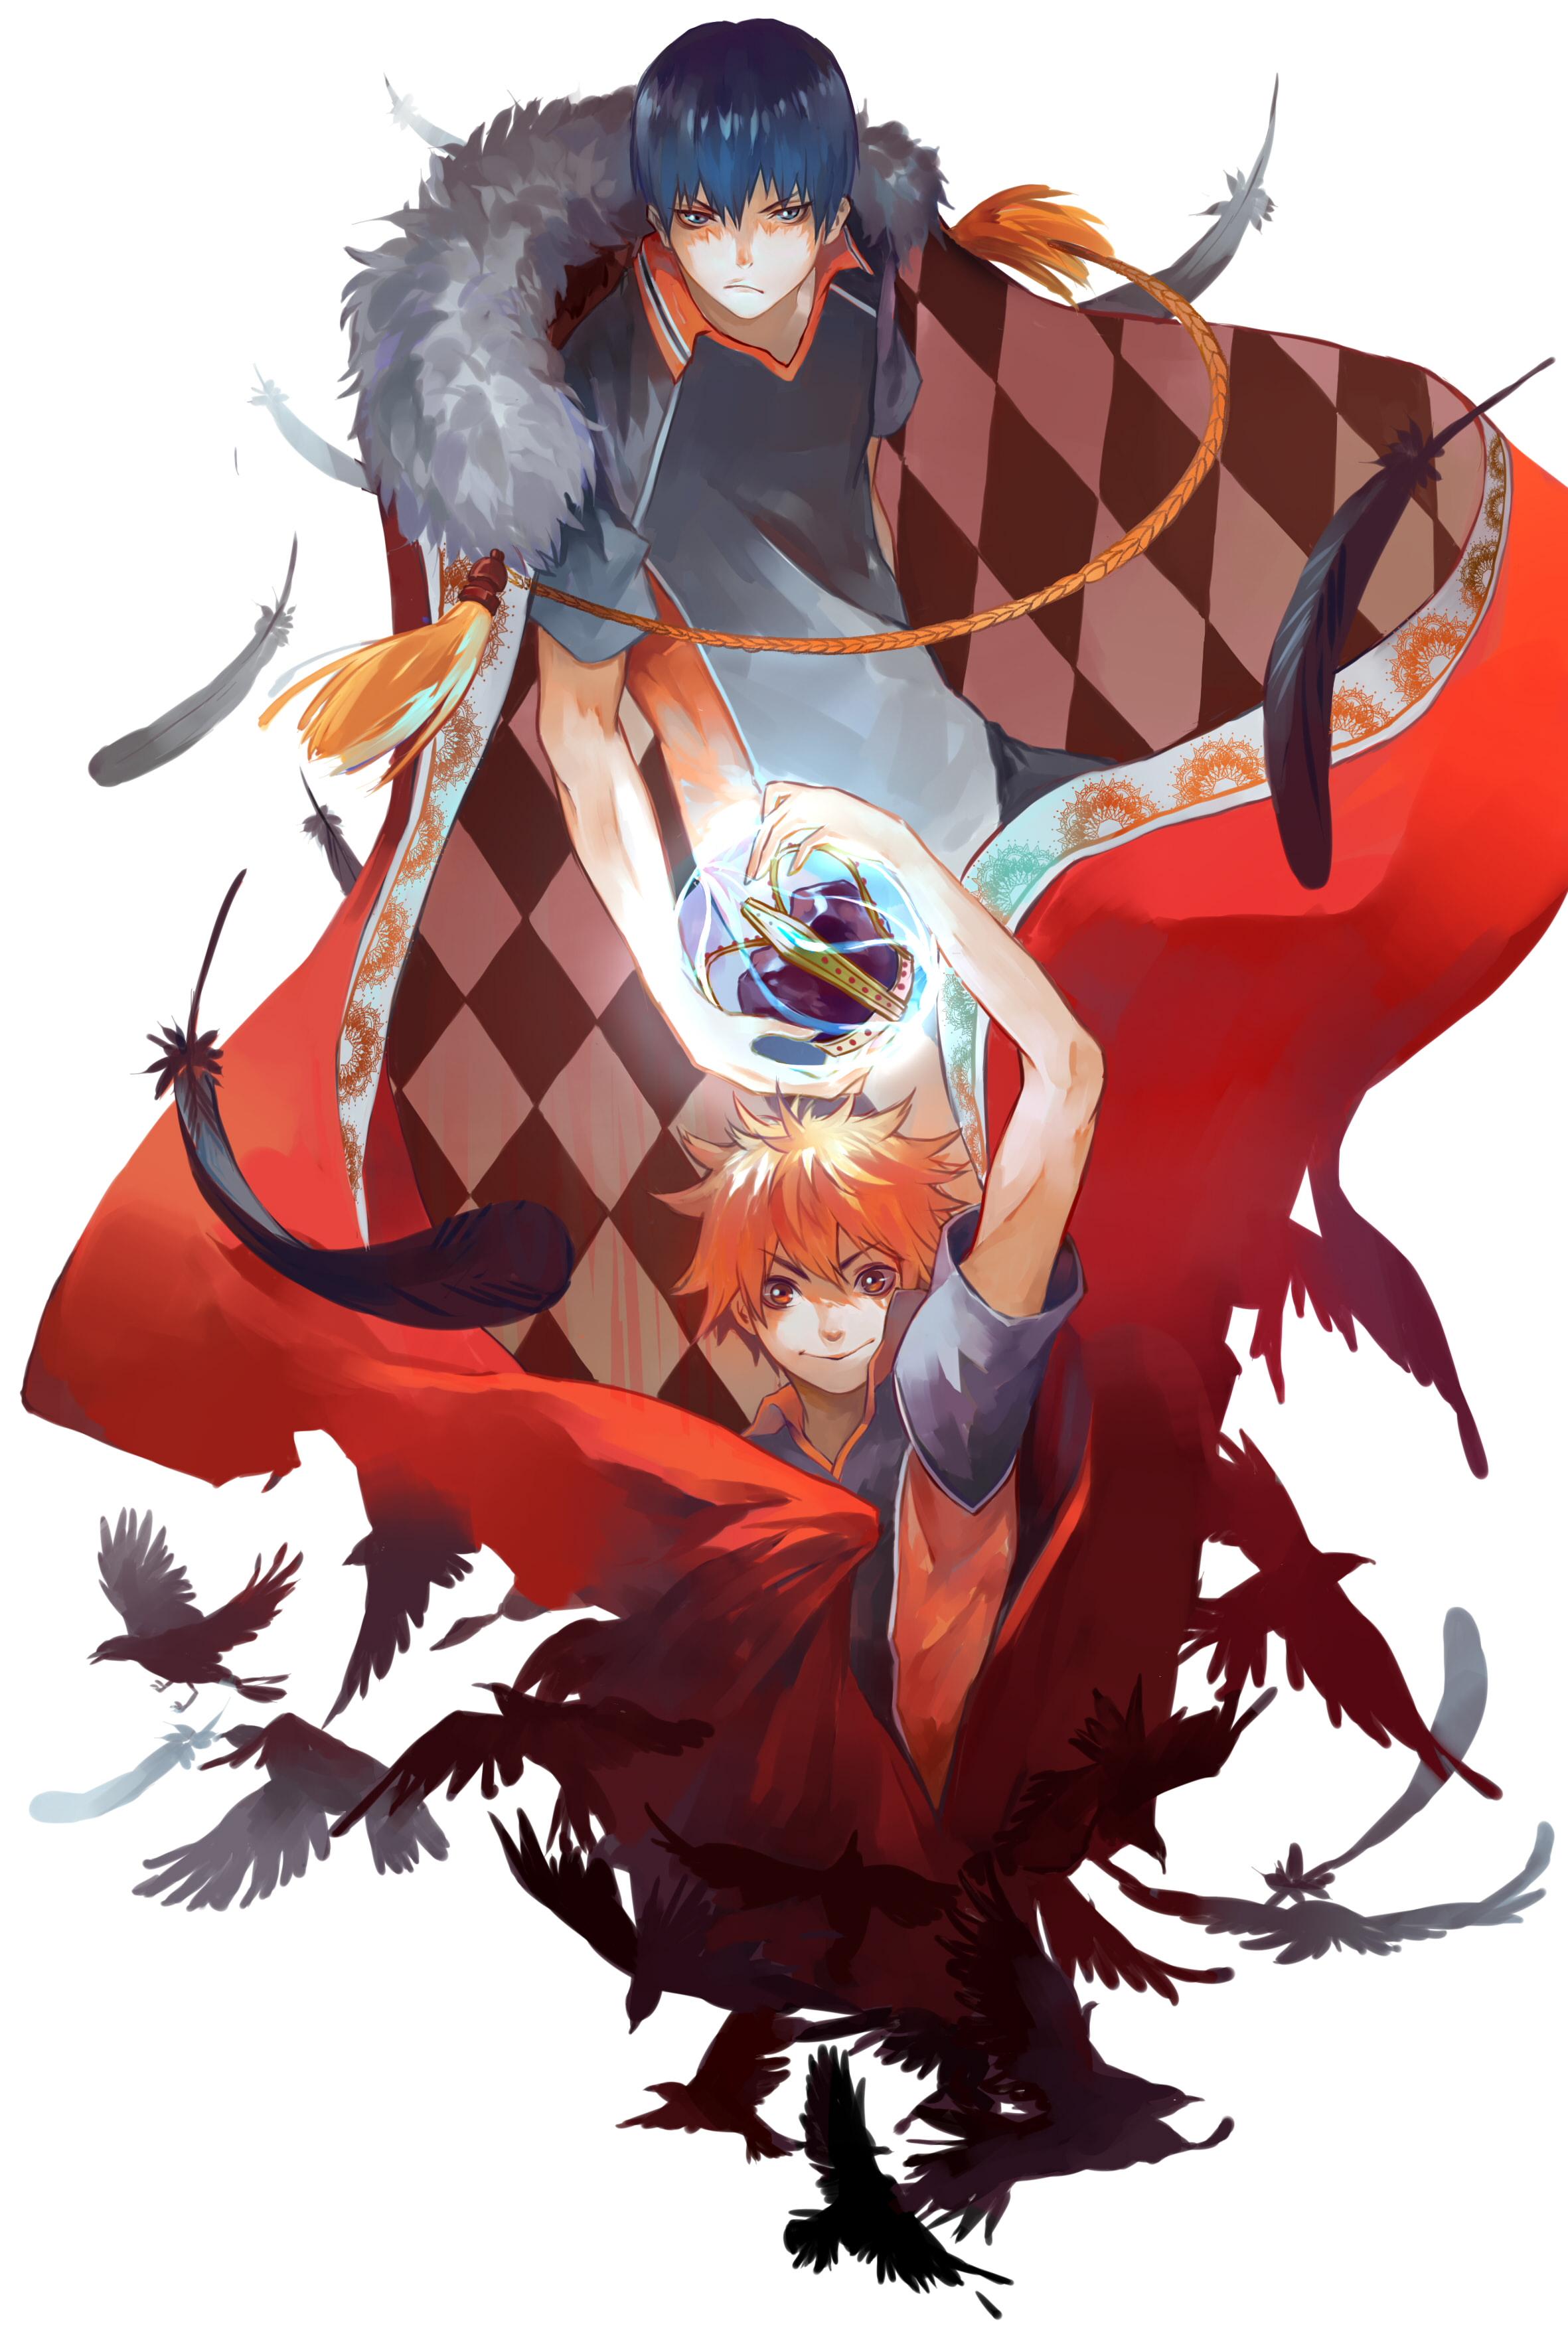 Haikyuu Mobile Wallpaper Zerochan Anime Image Board